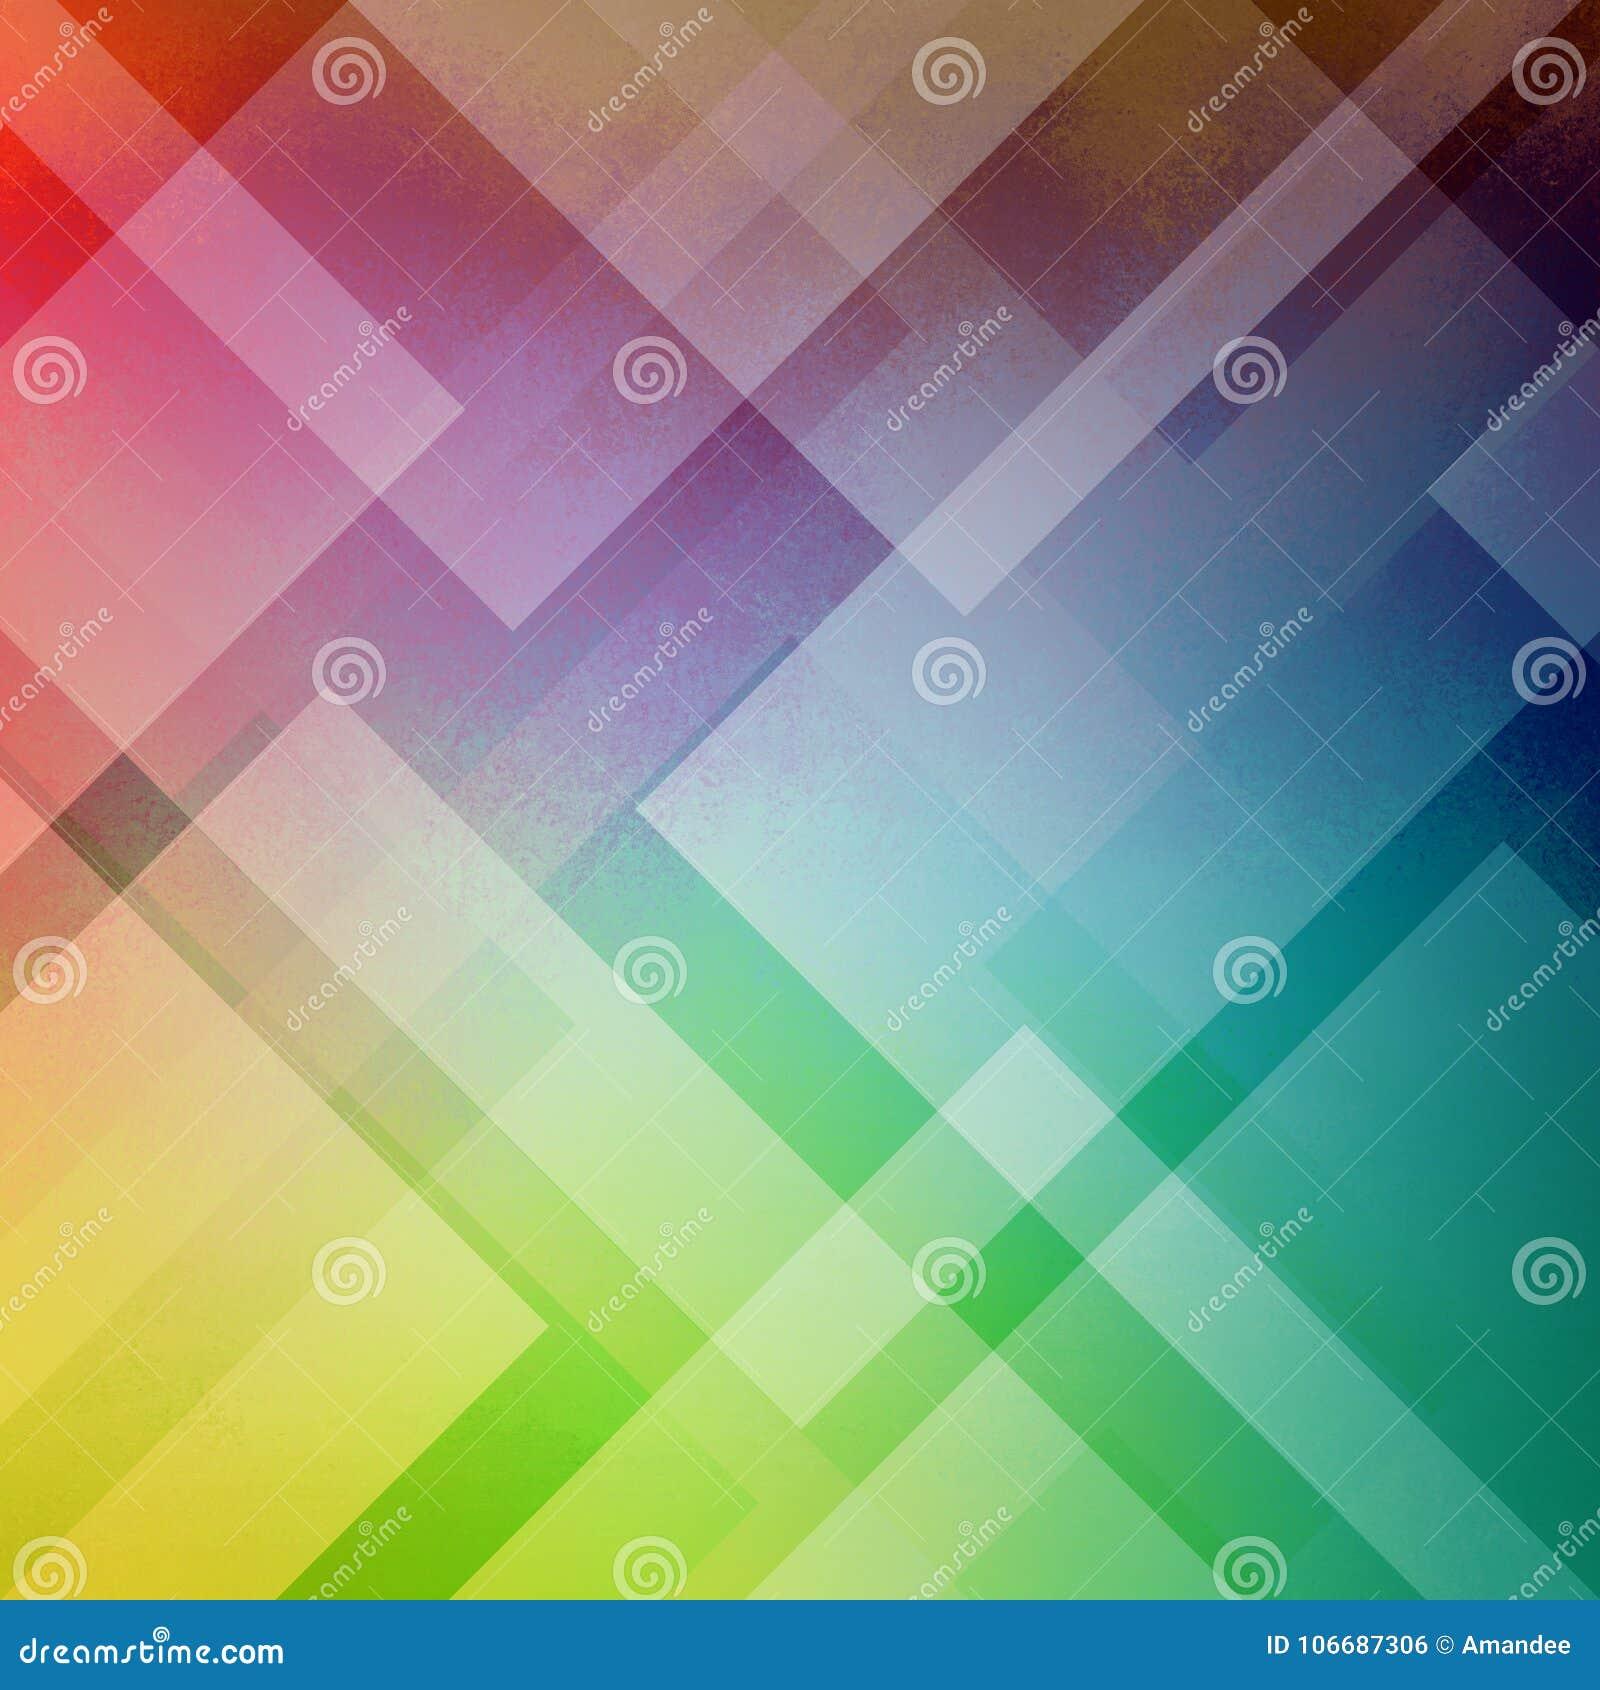 Lujoso Uñas De Color Púrpura Ideas De Diseño Foto Regalo - Ideas de ...